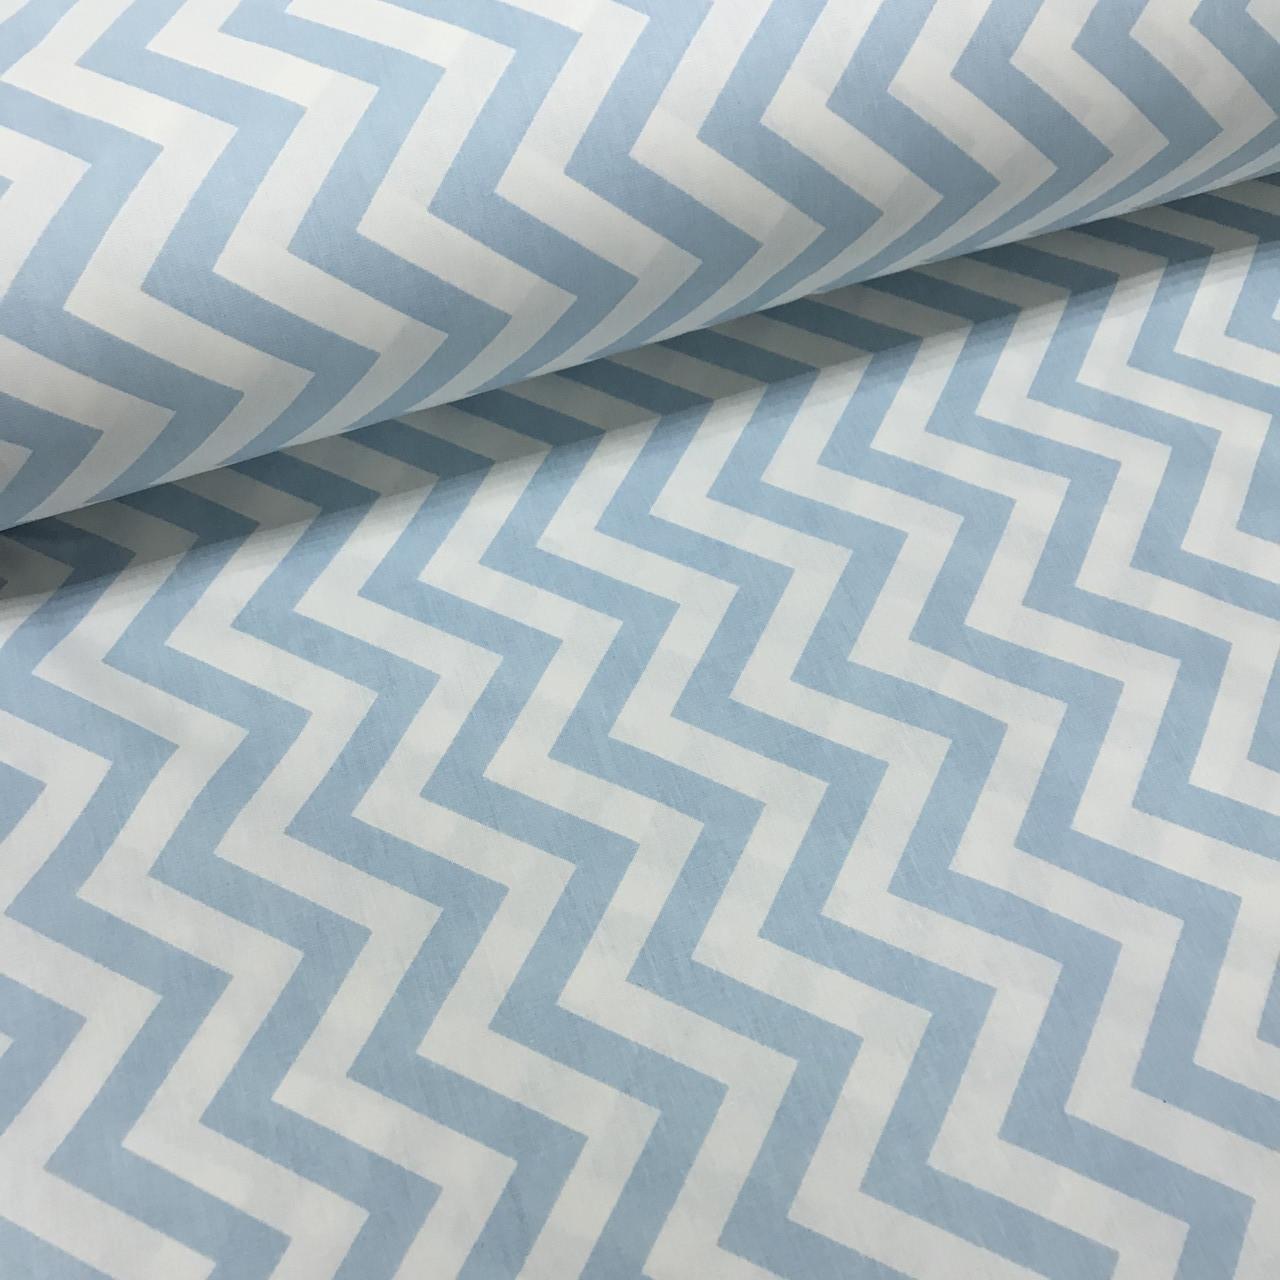 Ткань поплин зигзаг мелкий редкий голубой  (ТУРЦИЯ шир. 2,4 м)